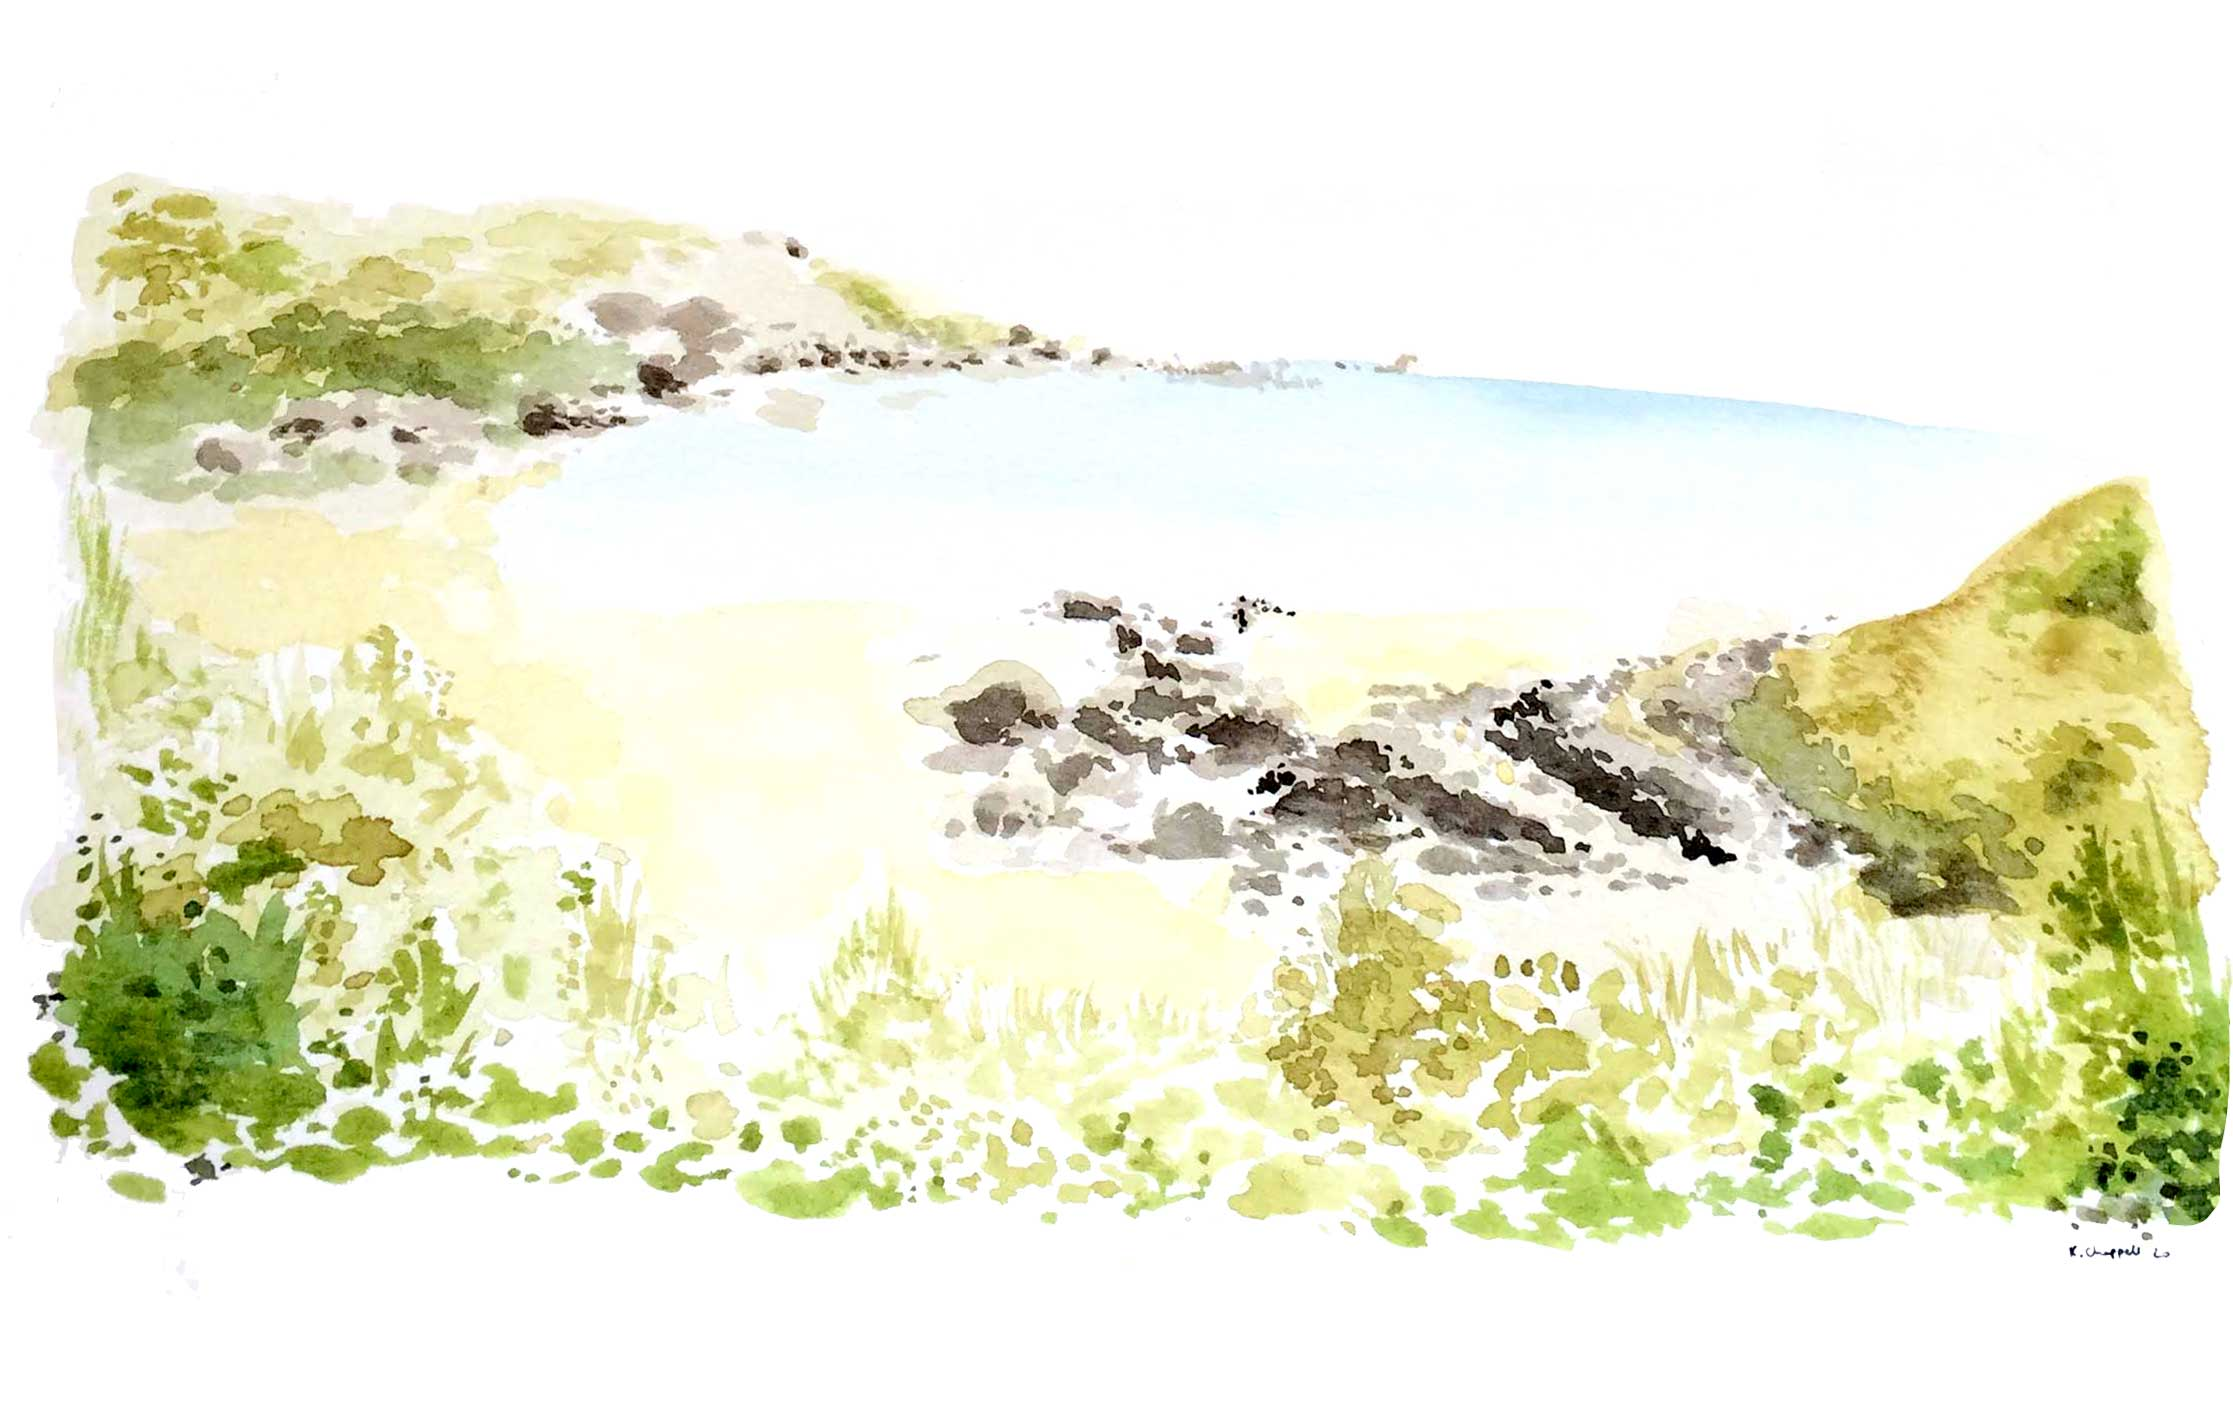 coldingham-sands-wedding-venue-live-painting-katie-chappell-northumberland.jpg